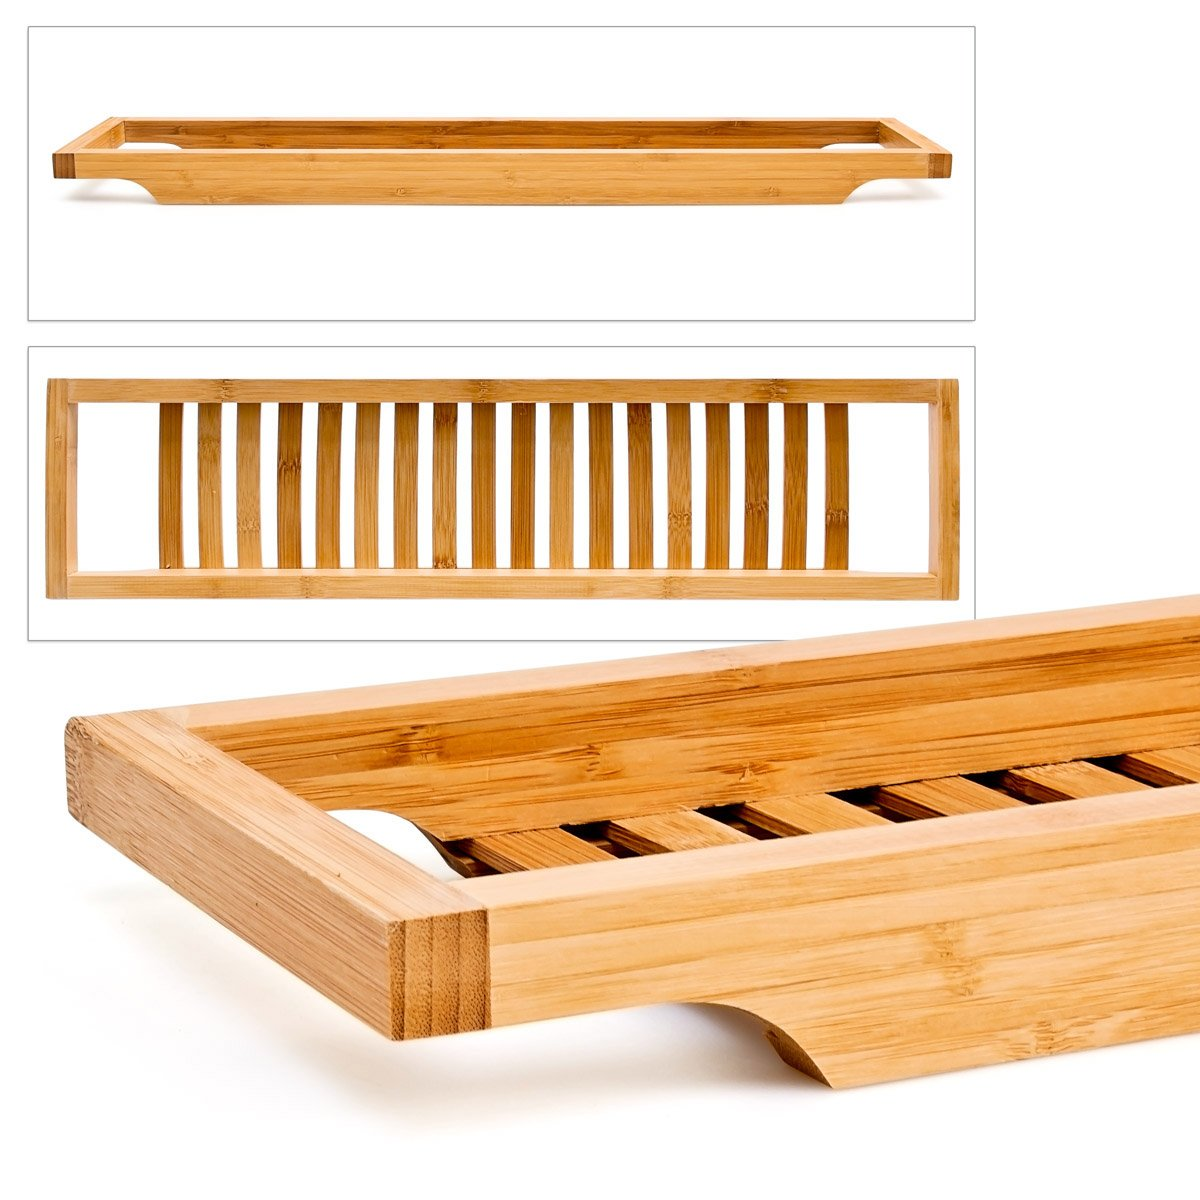 Slim Bamboo Bath Bridge, Bamboo Bath Shelf: Amazon.co.uk: DIY & Tools